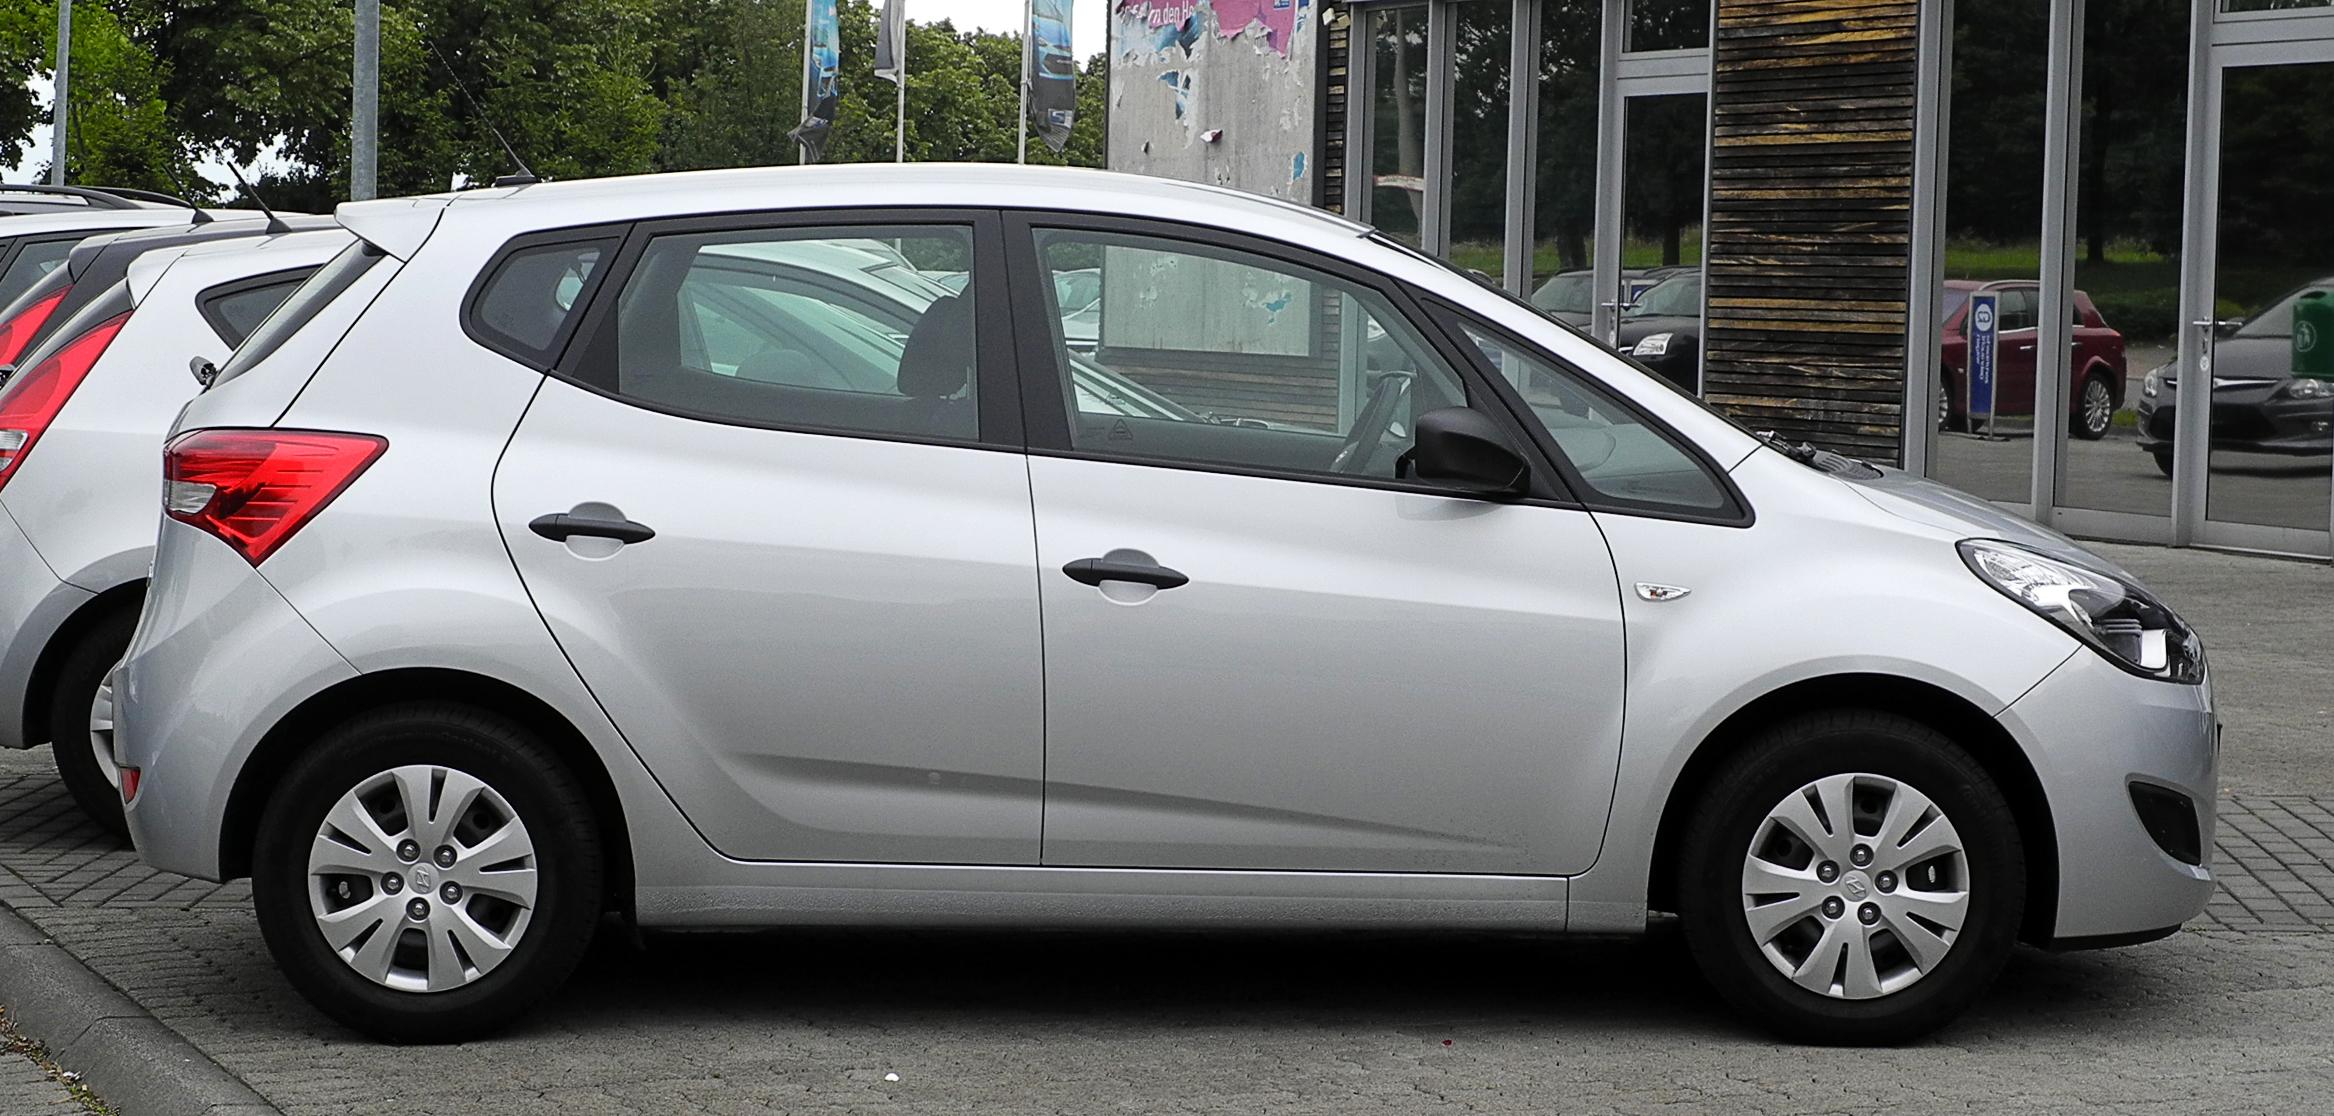 Hyundai_ix20_1.4_Classic_%E2%80%93_Seitenansicht,_13._Juni_2011,_Heiligenhaus.jpg